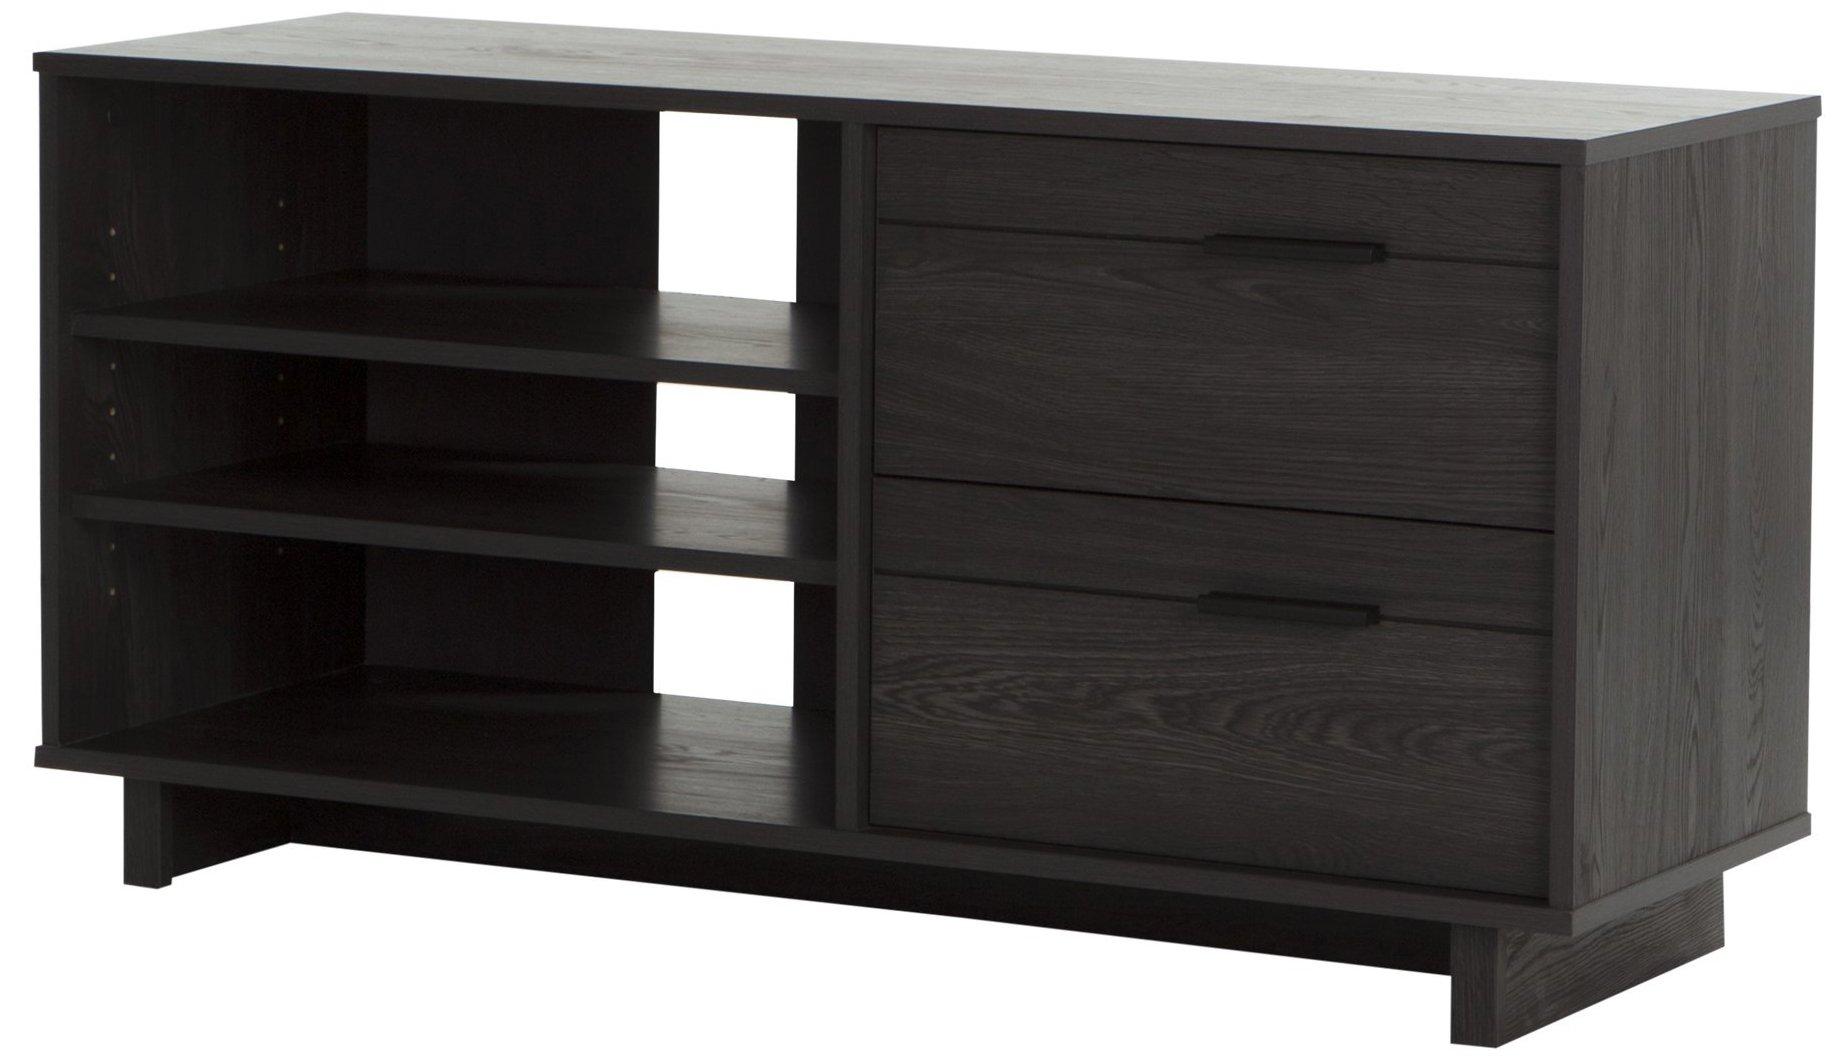 tv stand dresser for bedroom amazon com rh amazon com IKEA TV Stands Furniture Modern TV Stands Furniture